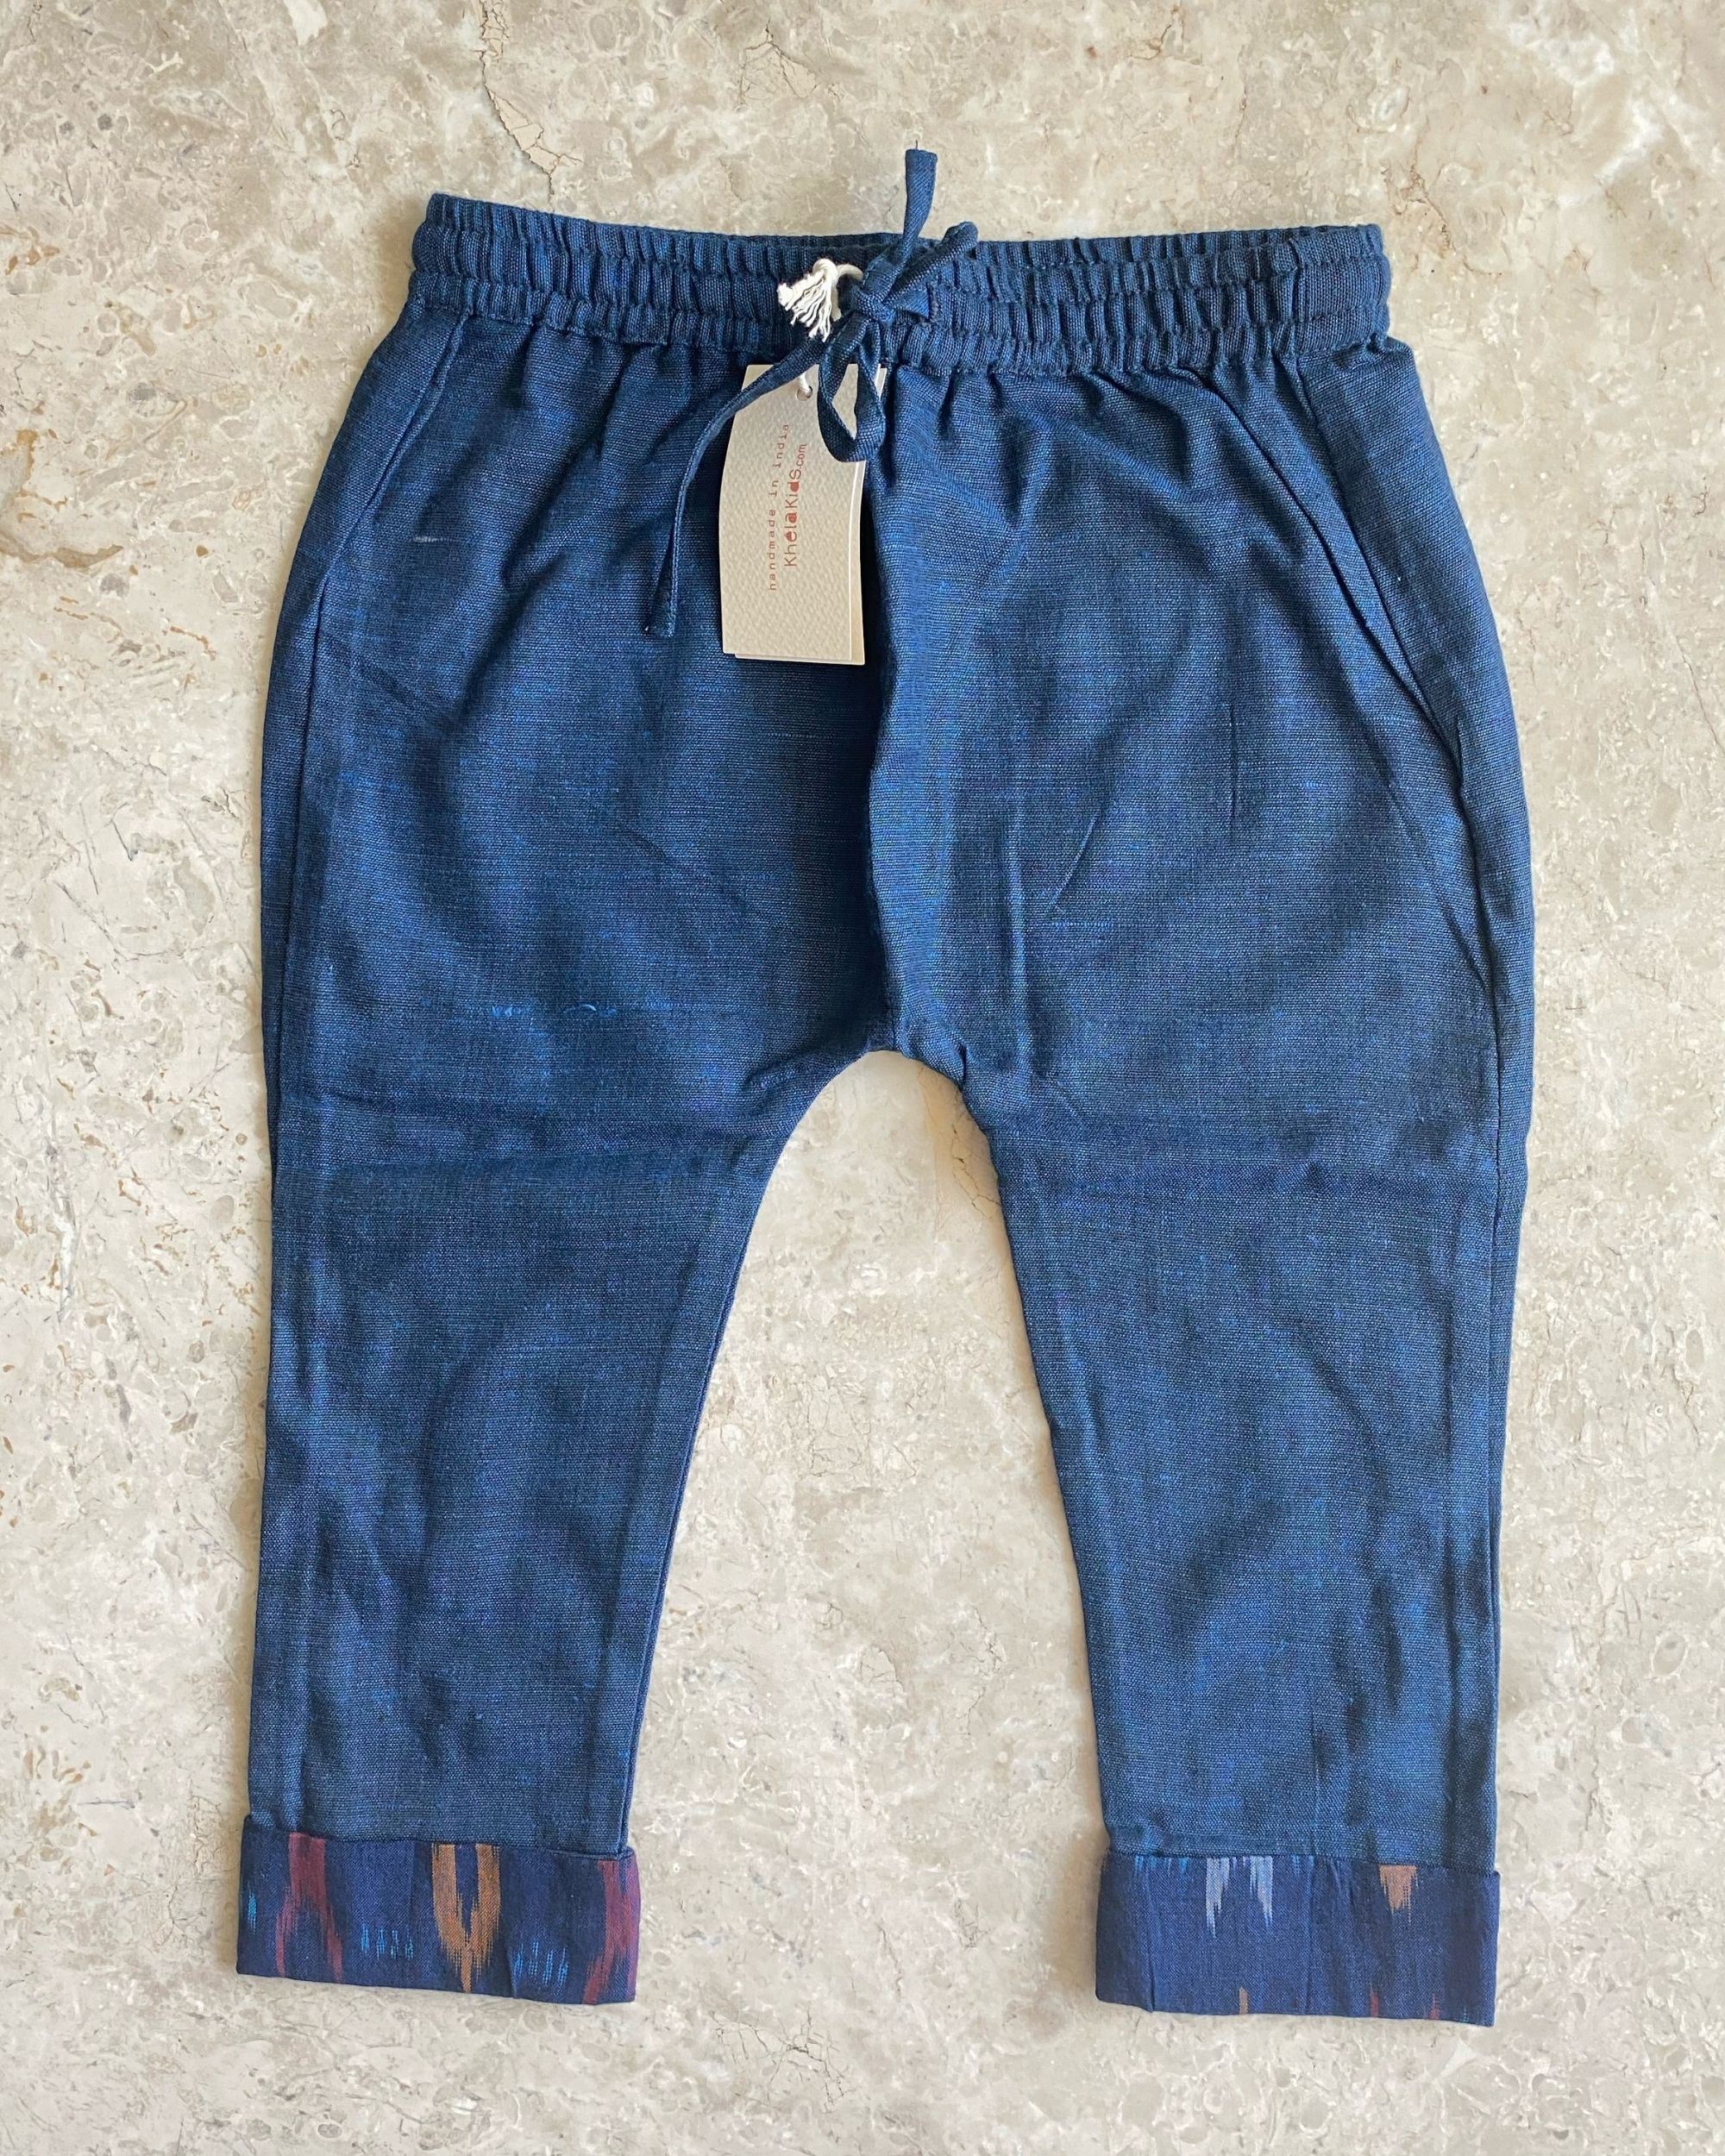 Indigo malkha cotton pants